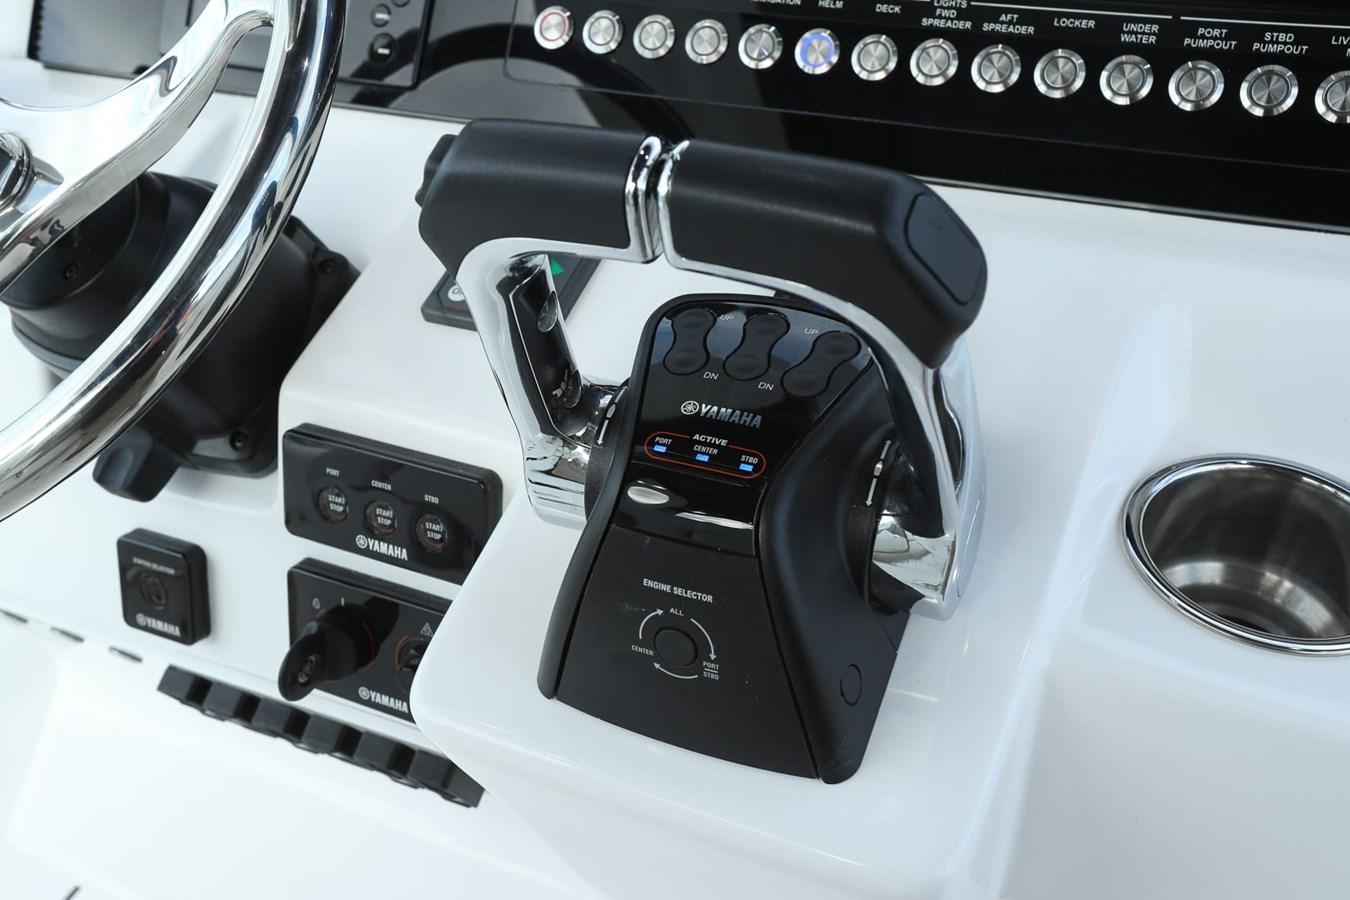 EdgeWater-262cx-Yamaha-Outboard-Controls